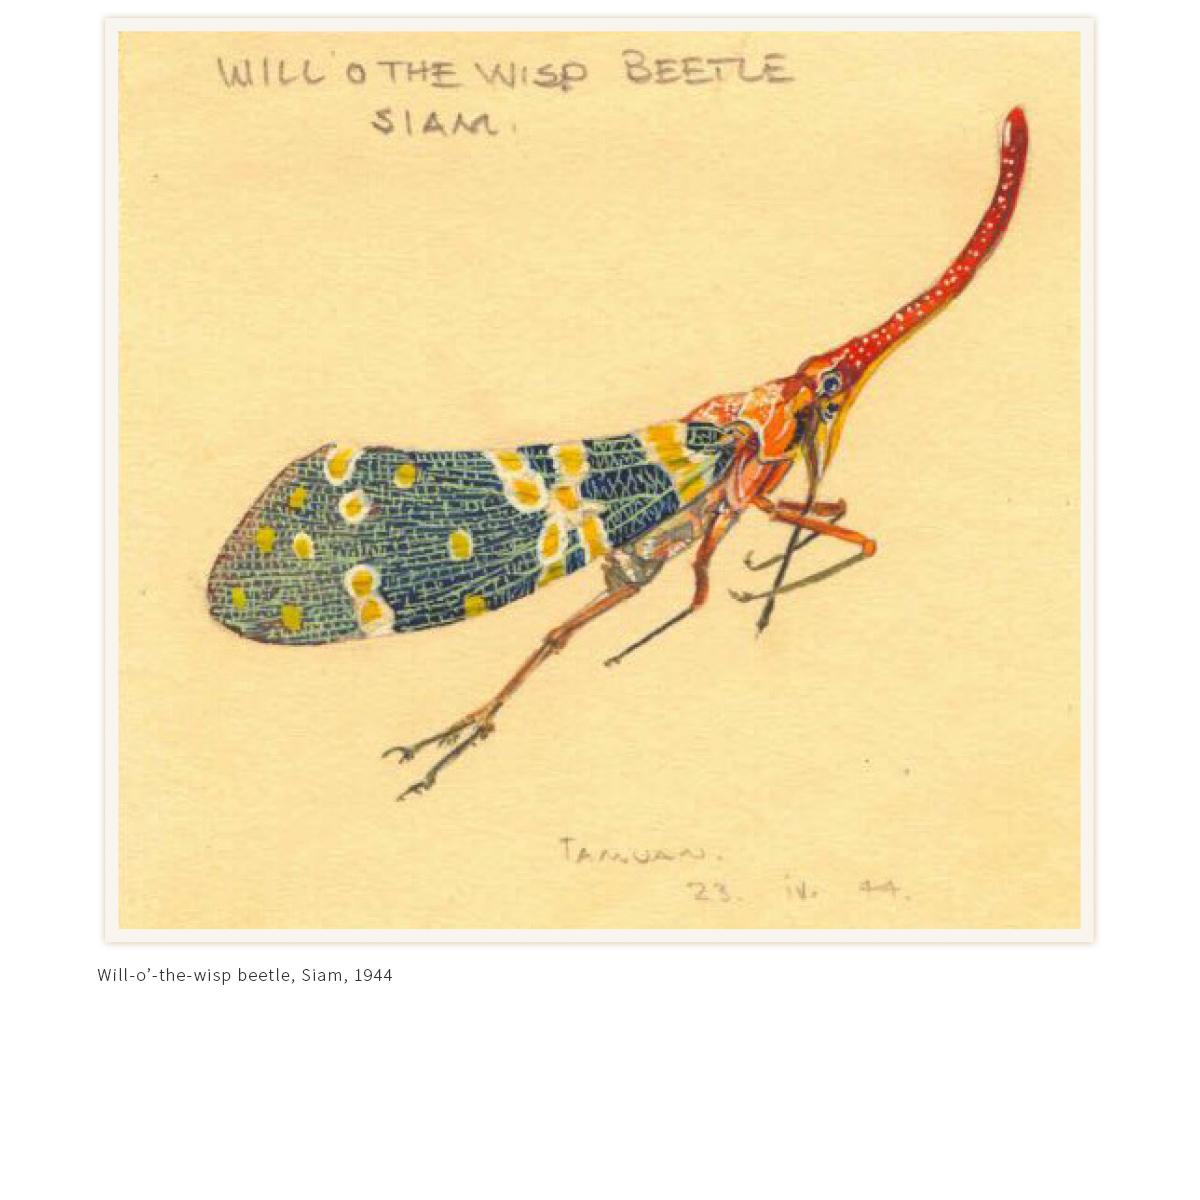 Will-o-wisp